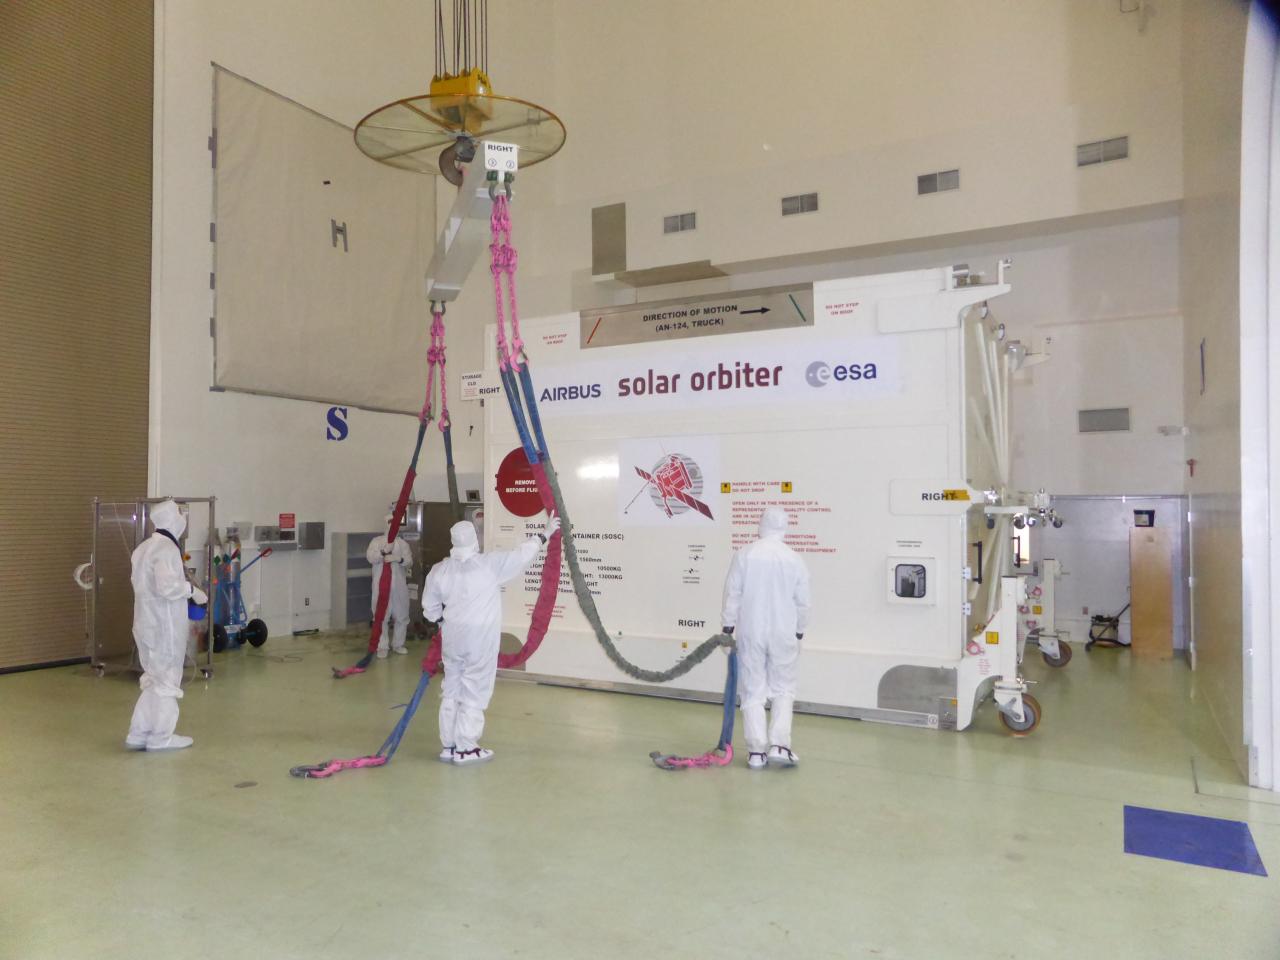 Solar_Orbiter_launch_campaign_begins_1_1280.jpg